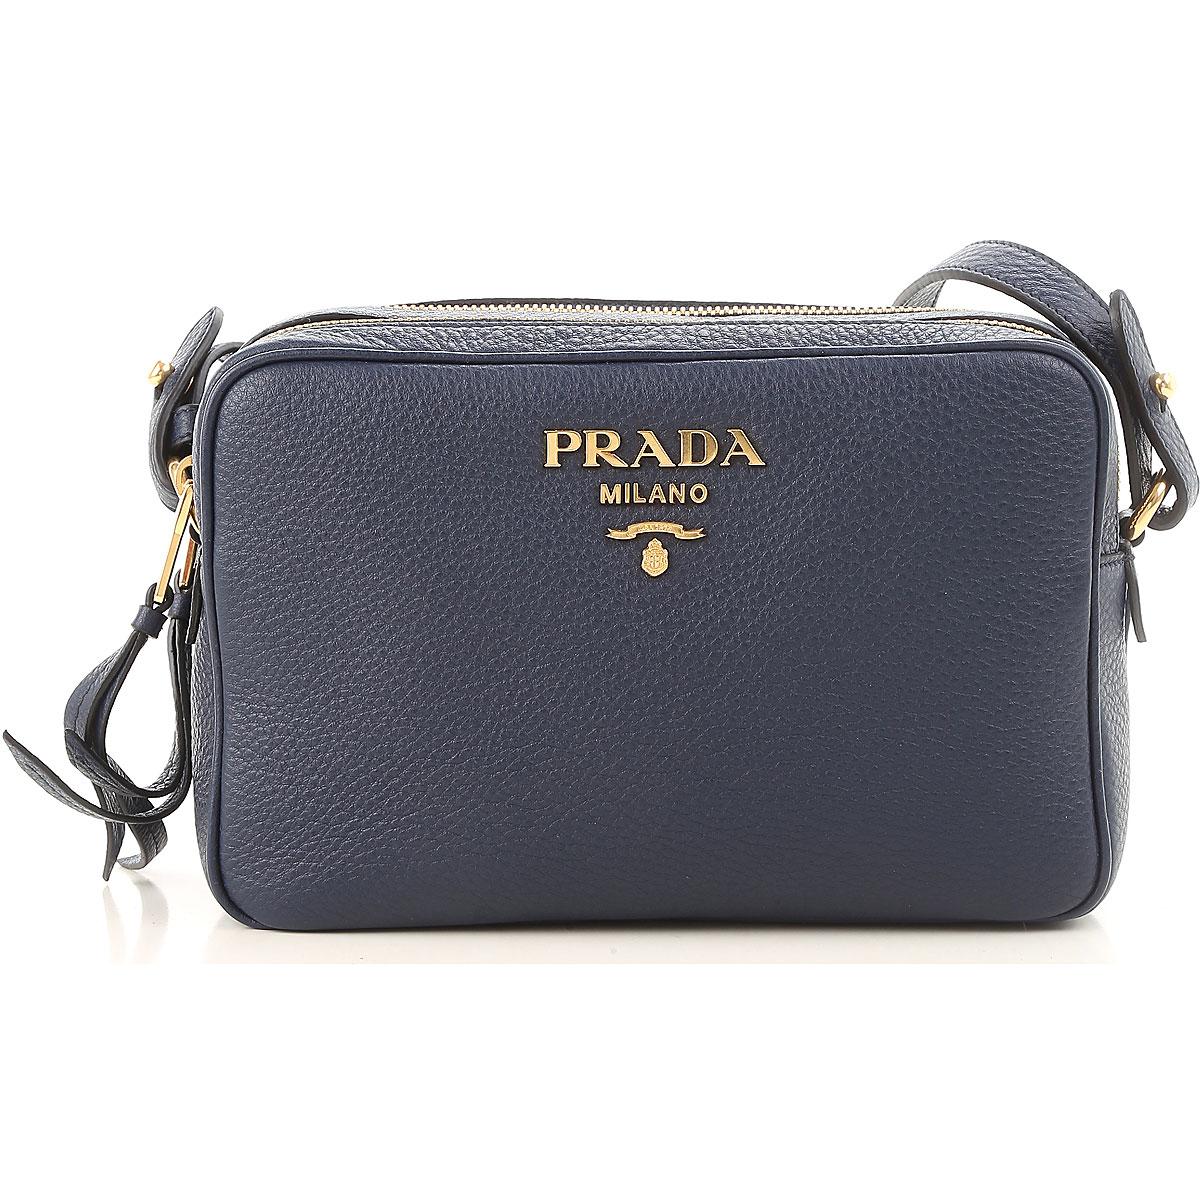 2769db8b745ce Handbags Prada